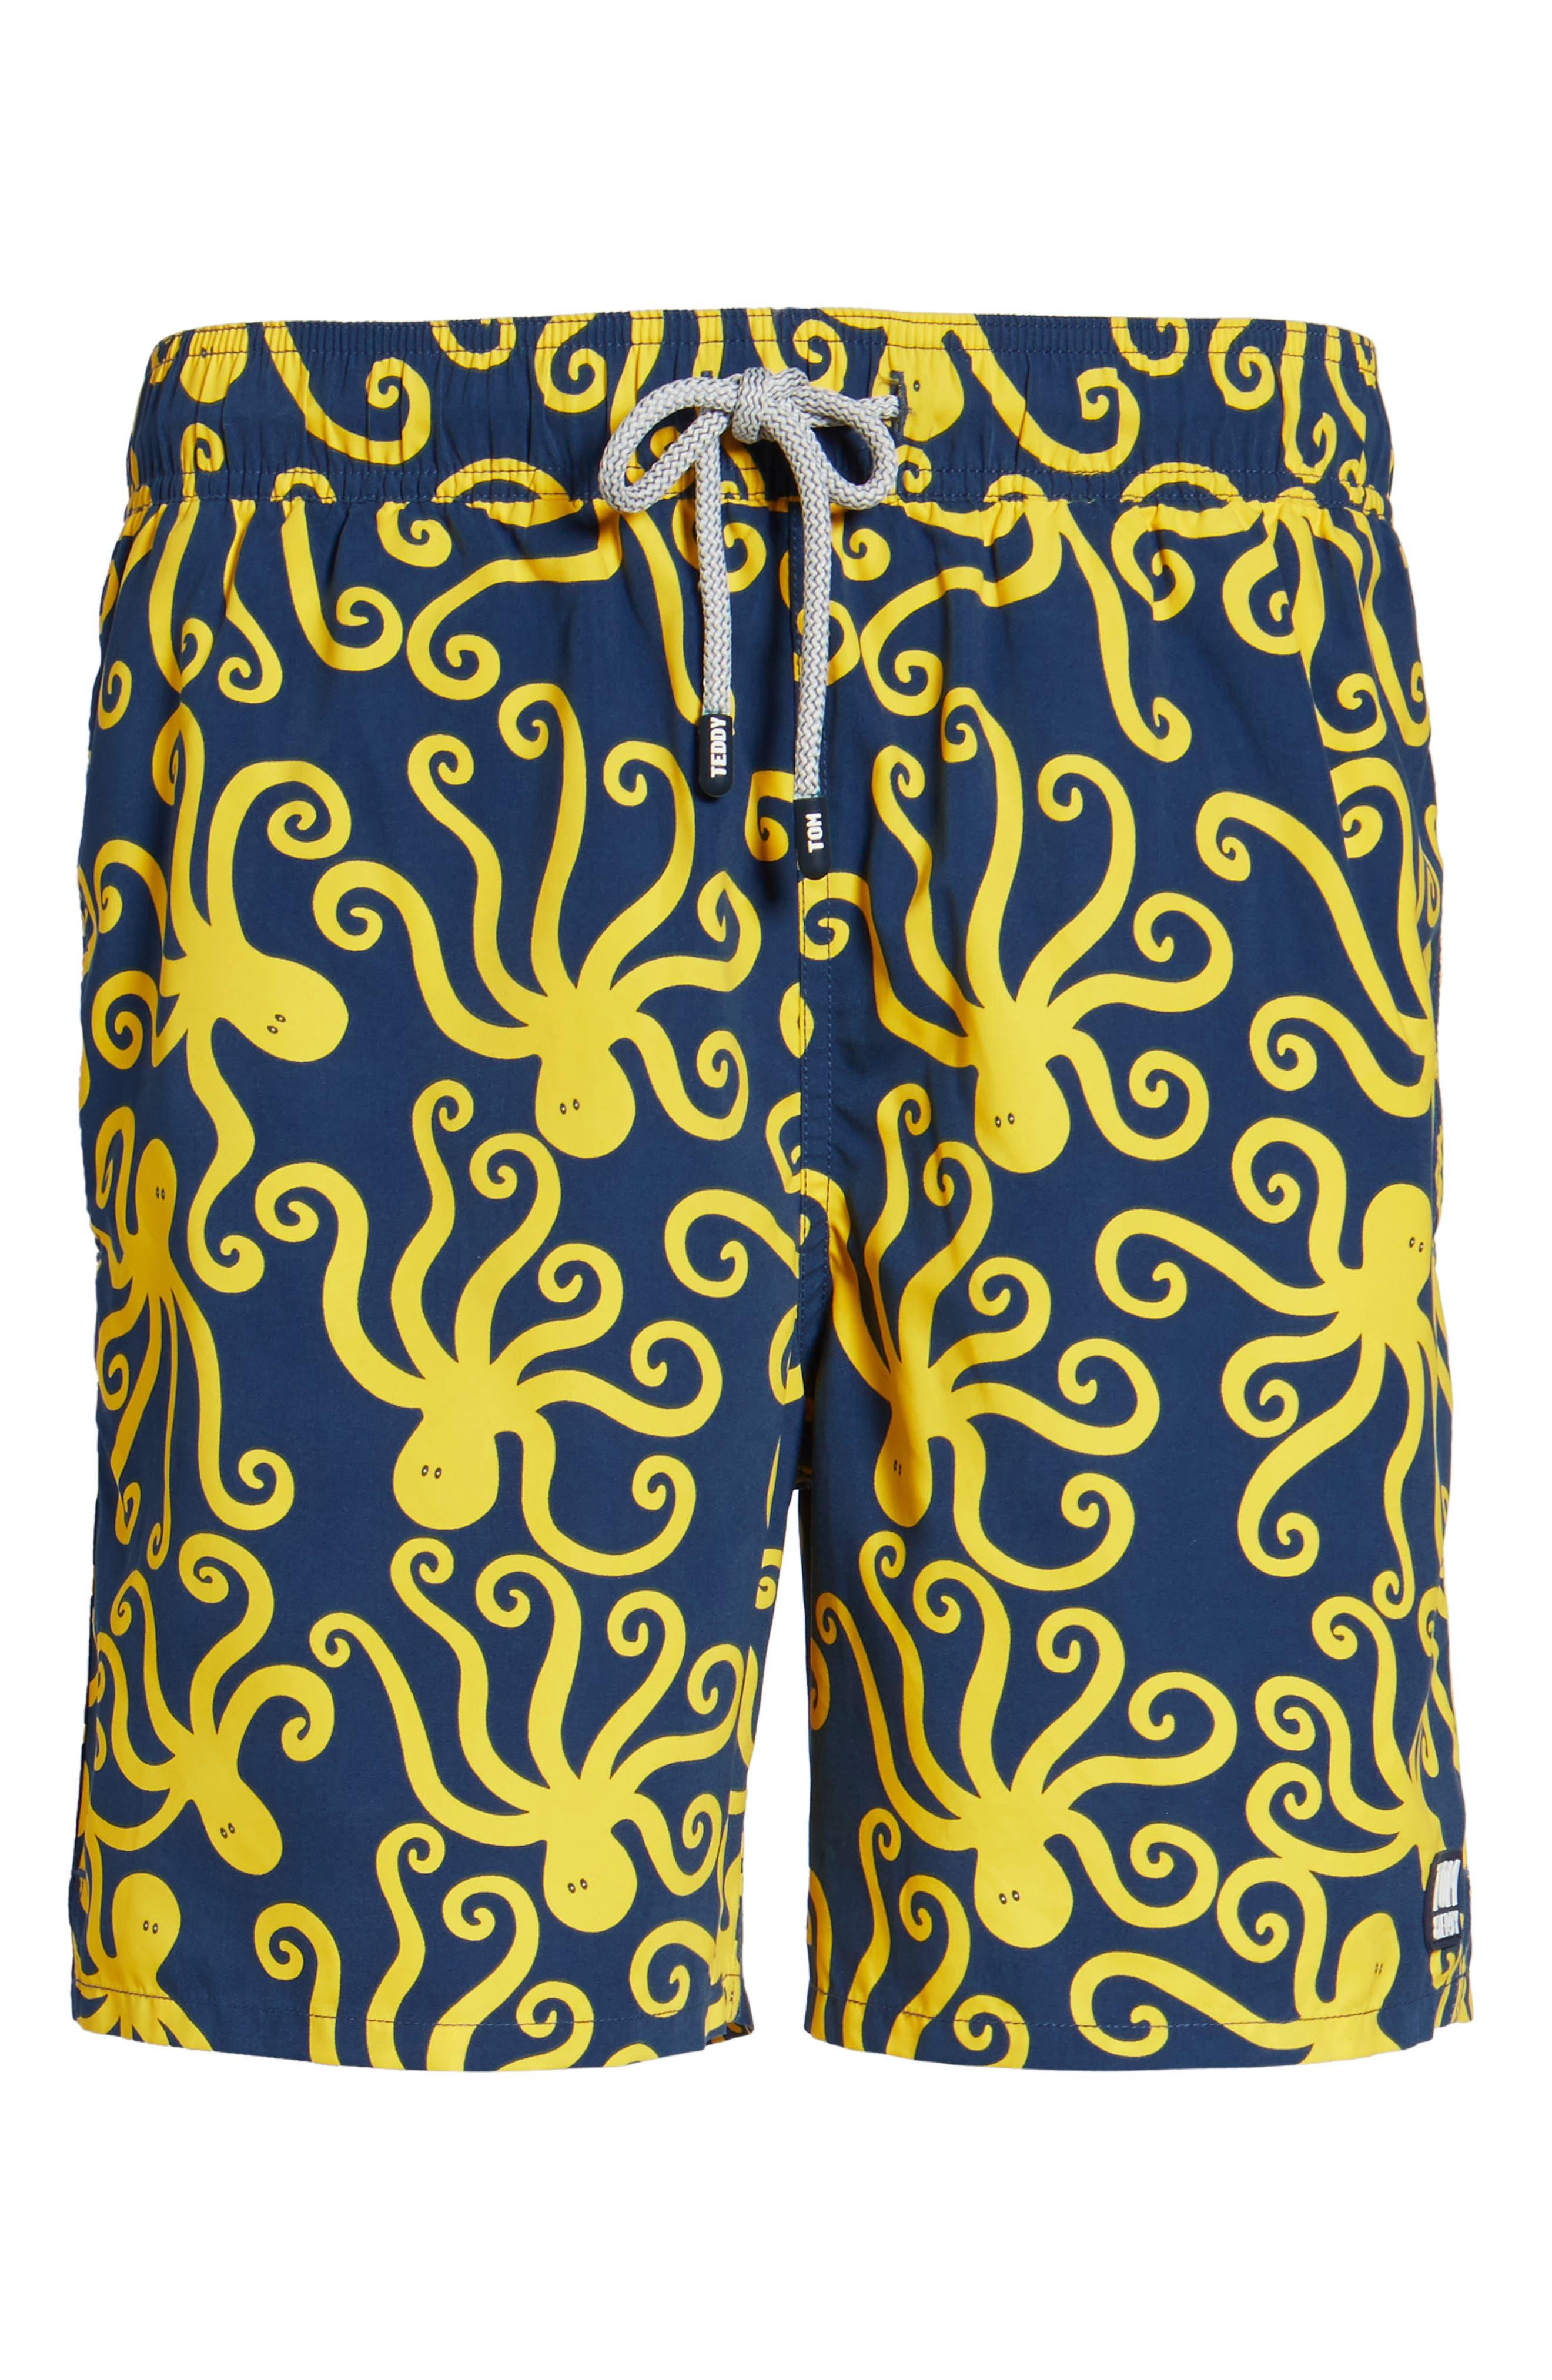 Octopus Swim Trunks,                             Alternate thumbnail 6, color,                             Blue Yellow